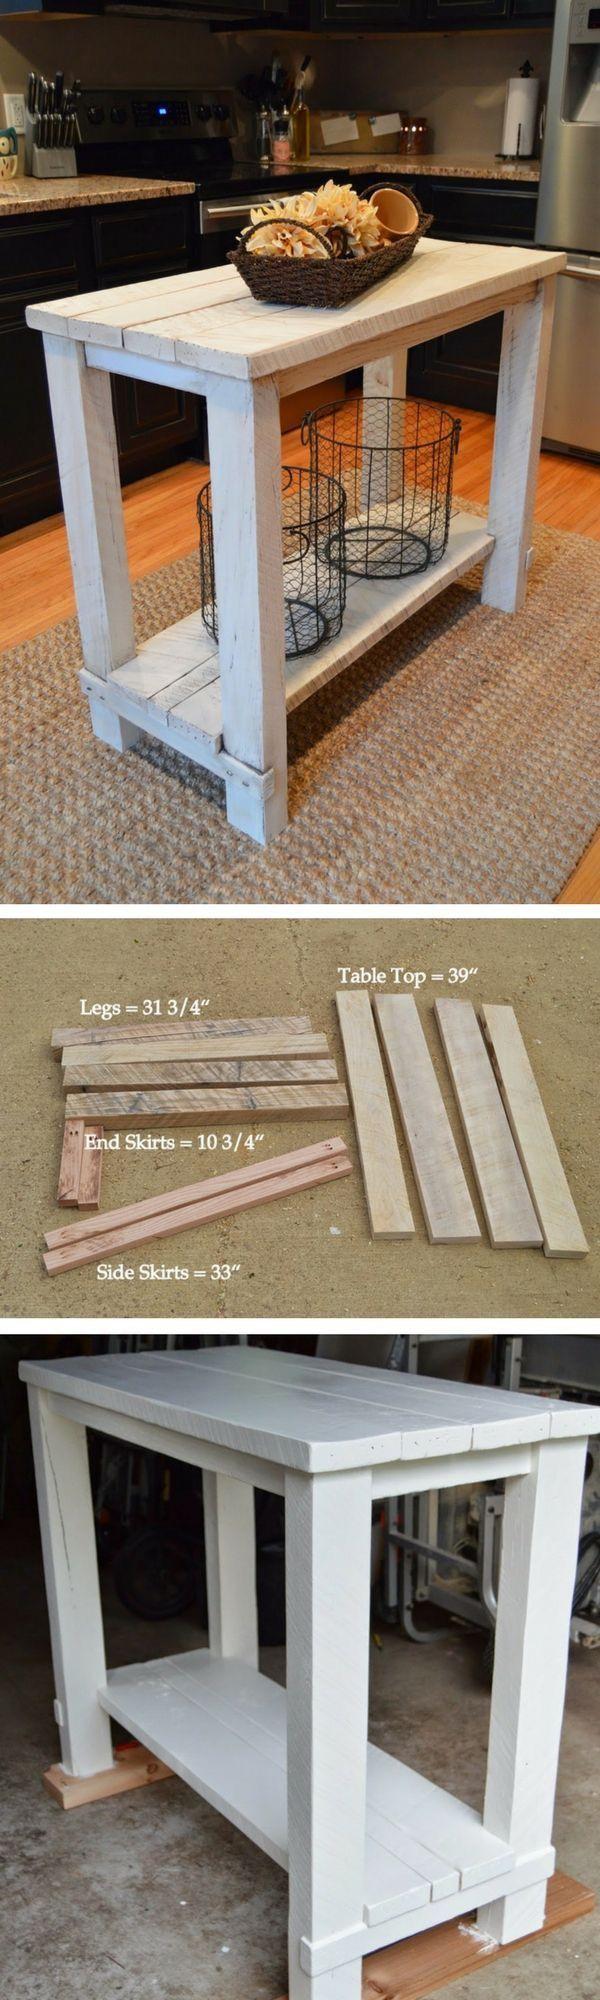 DIY kitchen island, table, desk. Quick and simple #ad #diyfurniture #farmhouse #fixerupper #kitchenisland #desk